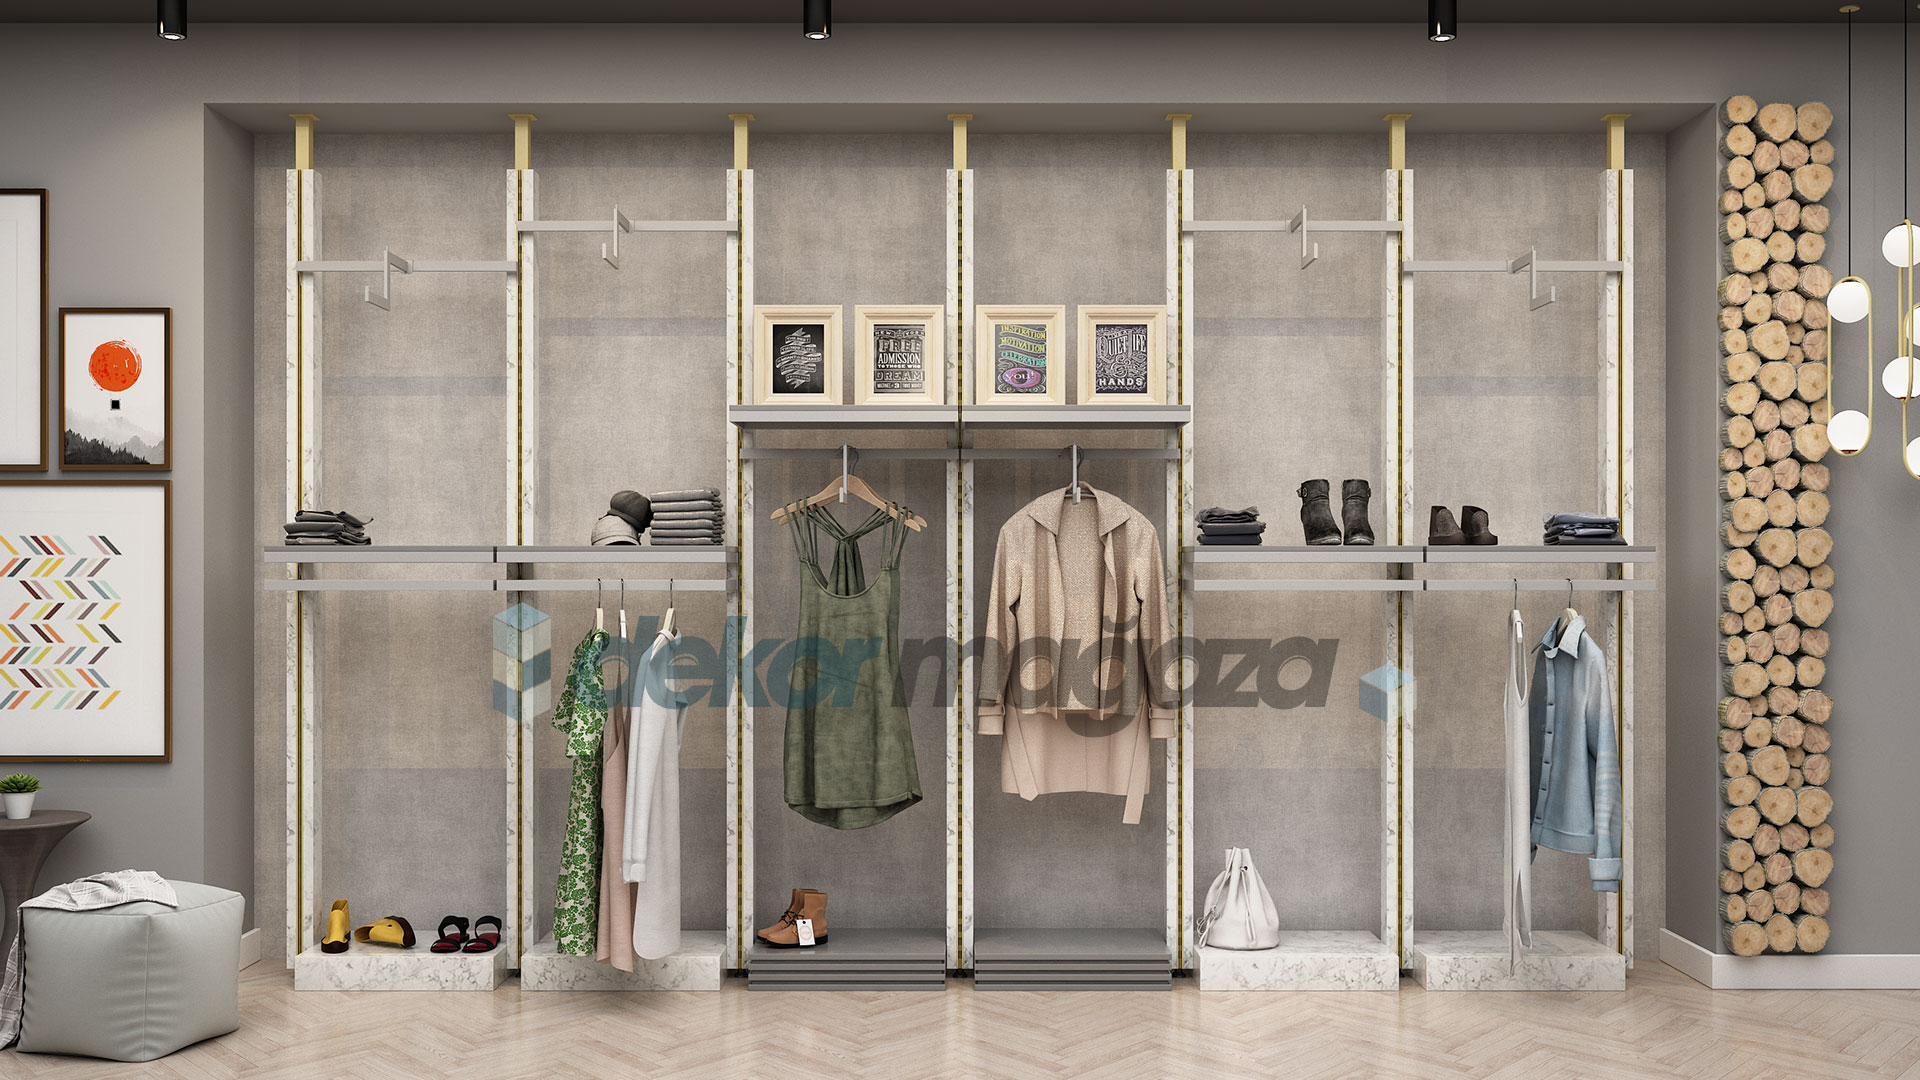 dekor-magaza-dekorasyon-magaza-raf-sistemleri-panos-032021-13-1